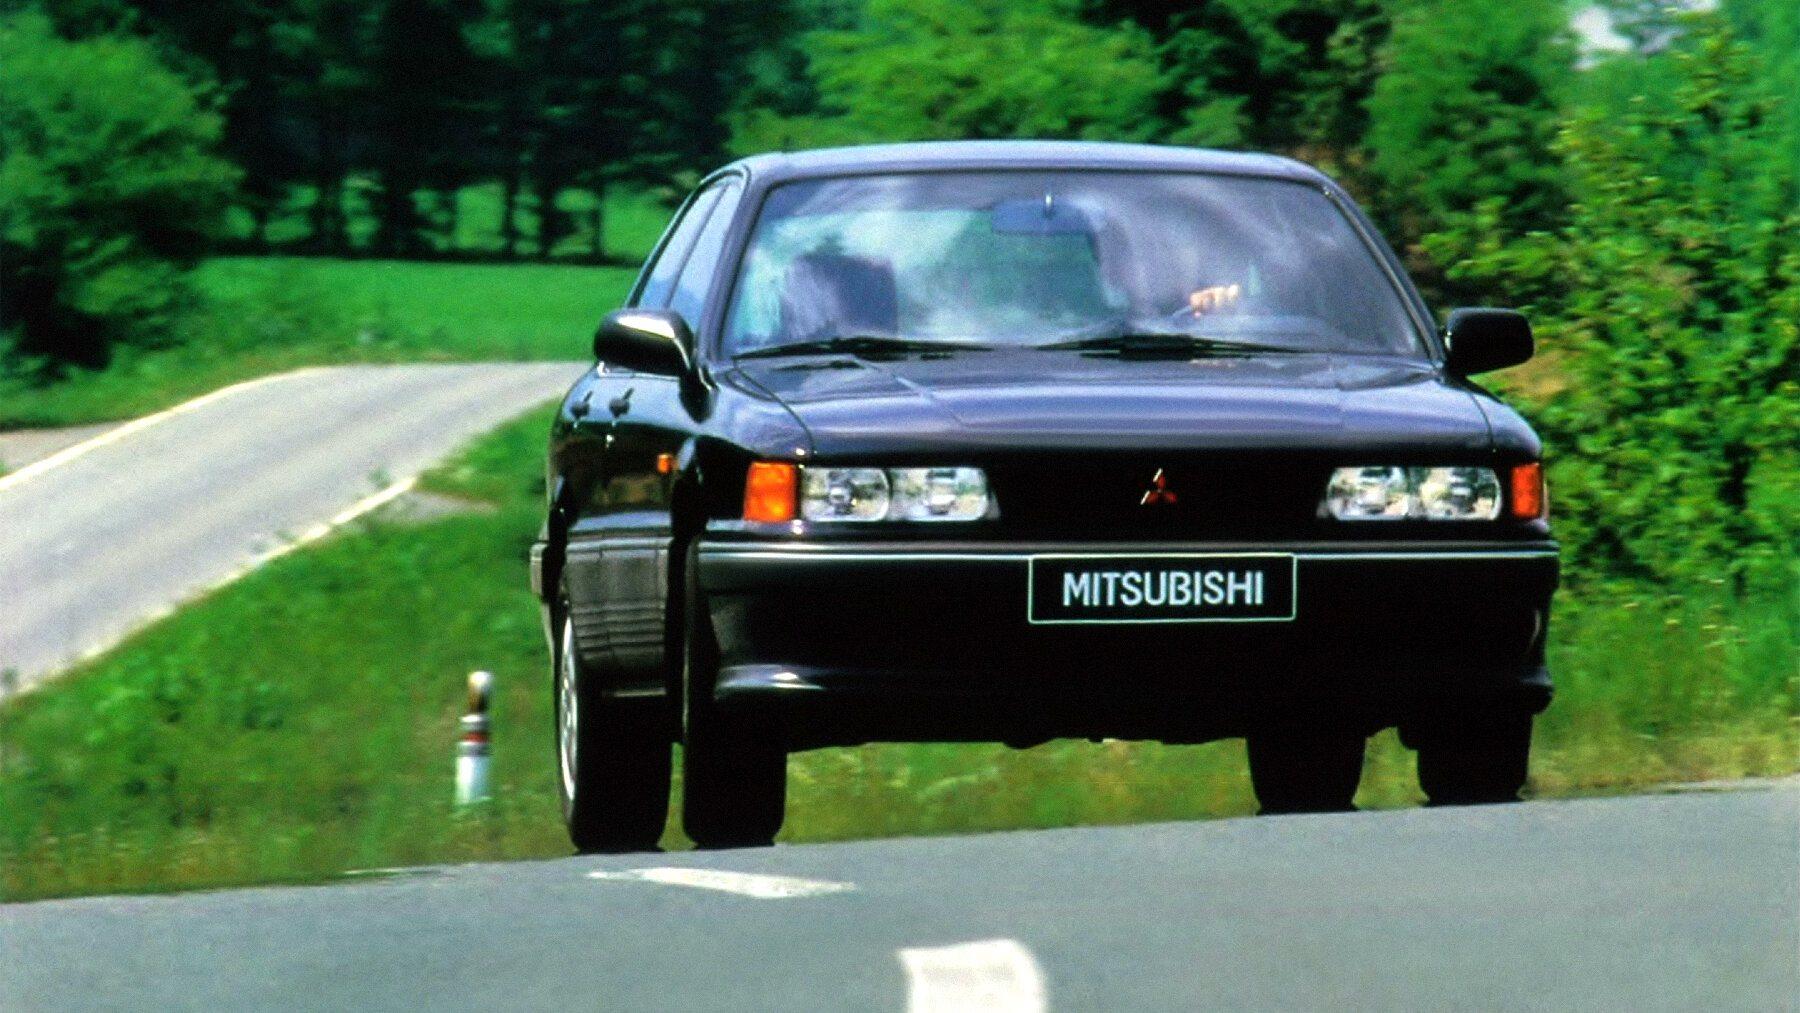 Coche del día: Mitsubishi Galant GTi-16v Dynamic 4